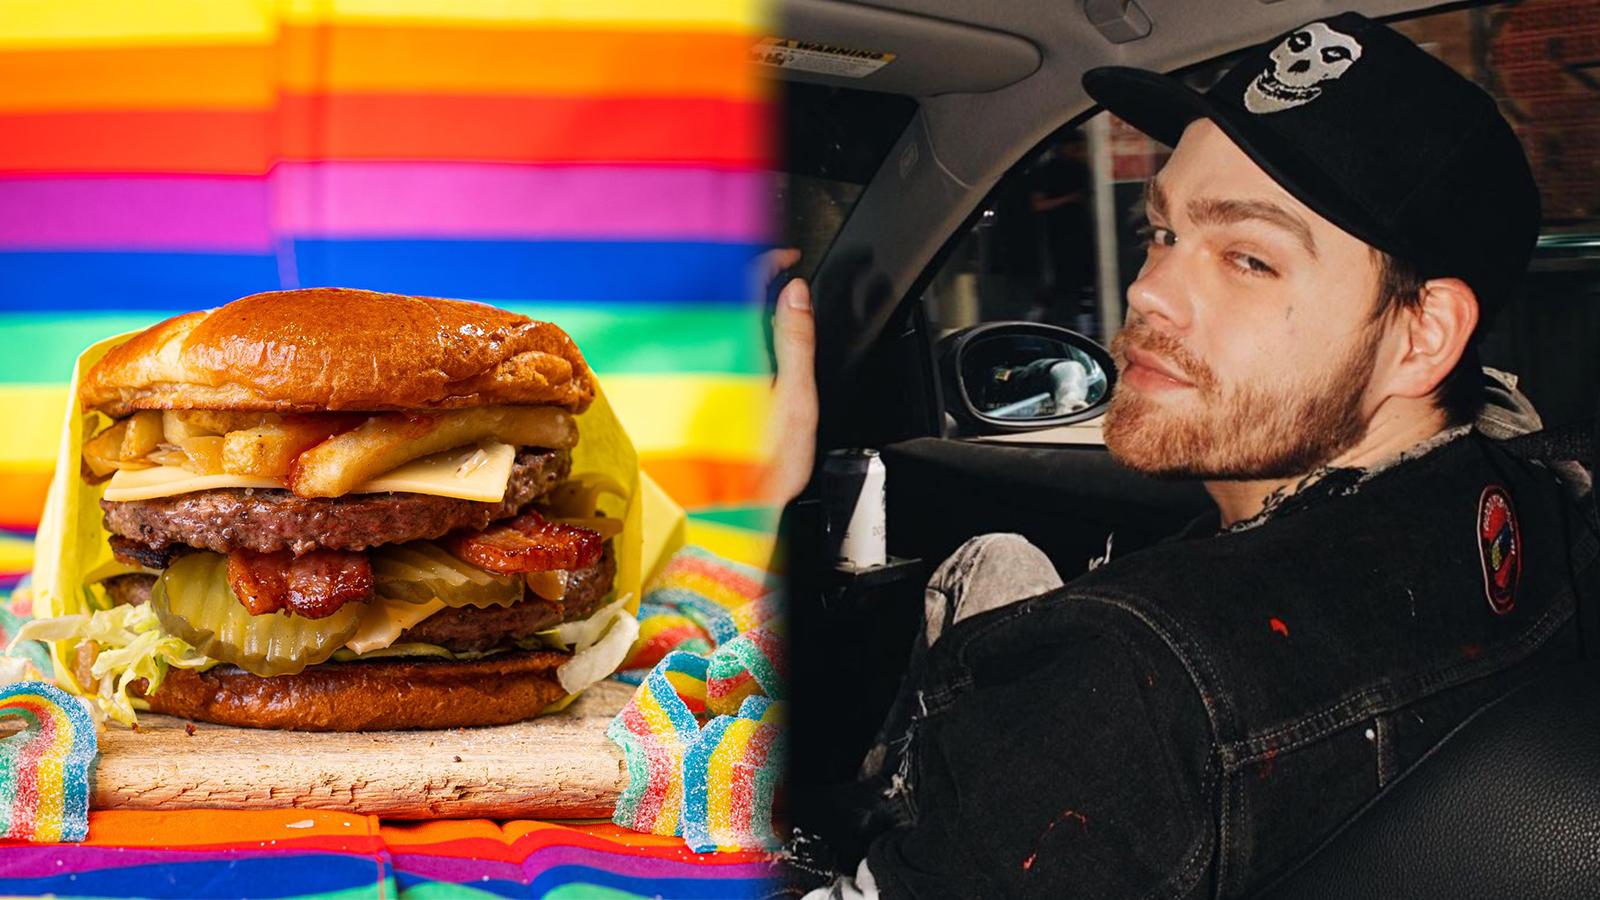 Elijah Daniel goes viral for Gay Burger chain